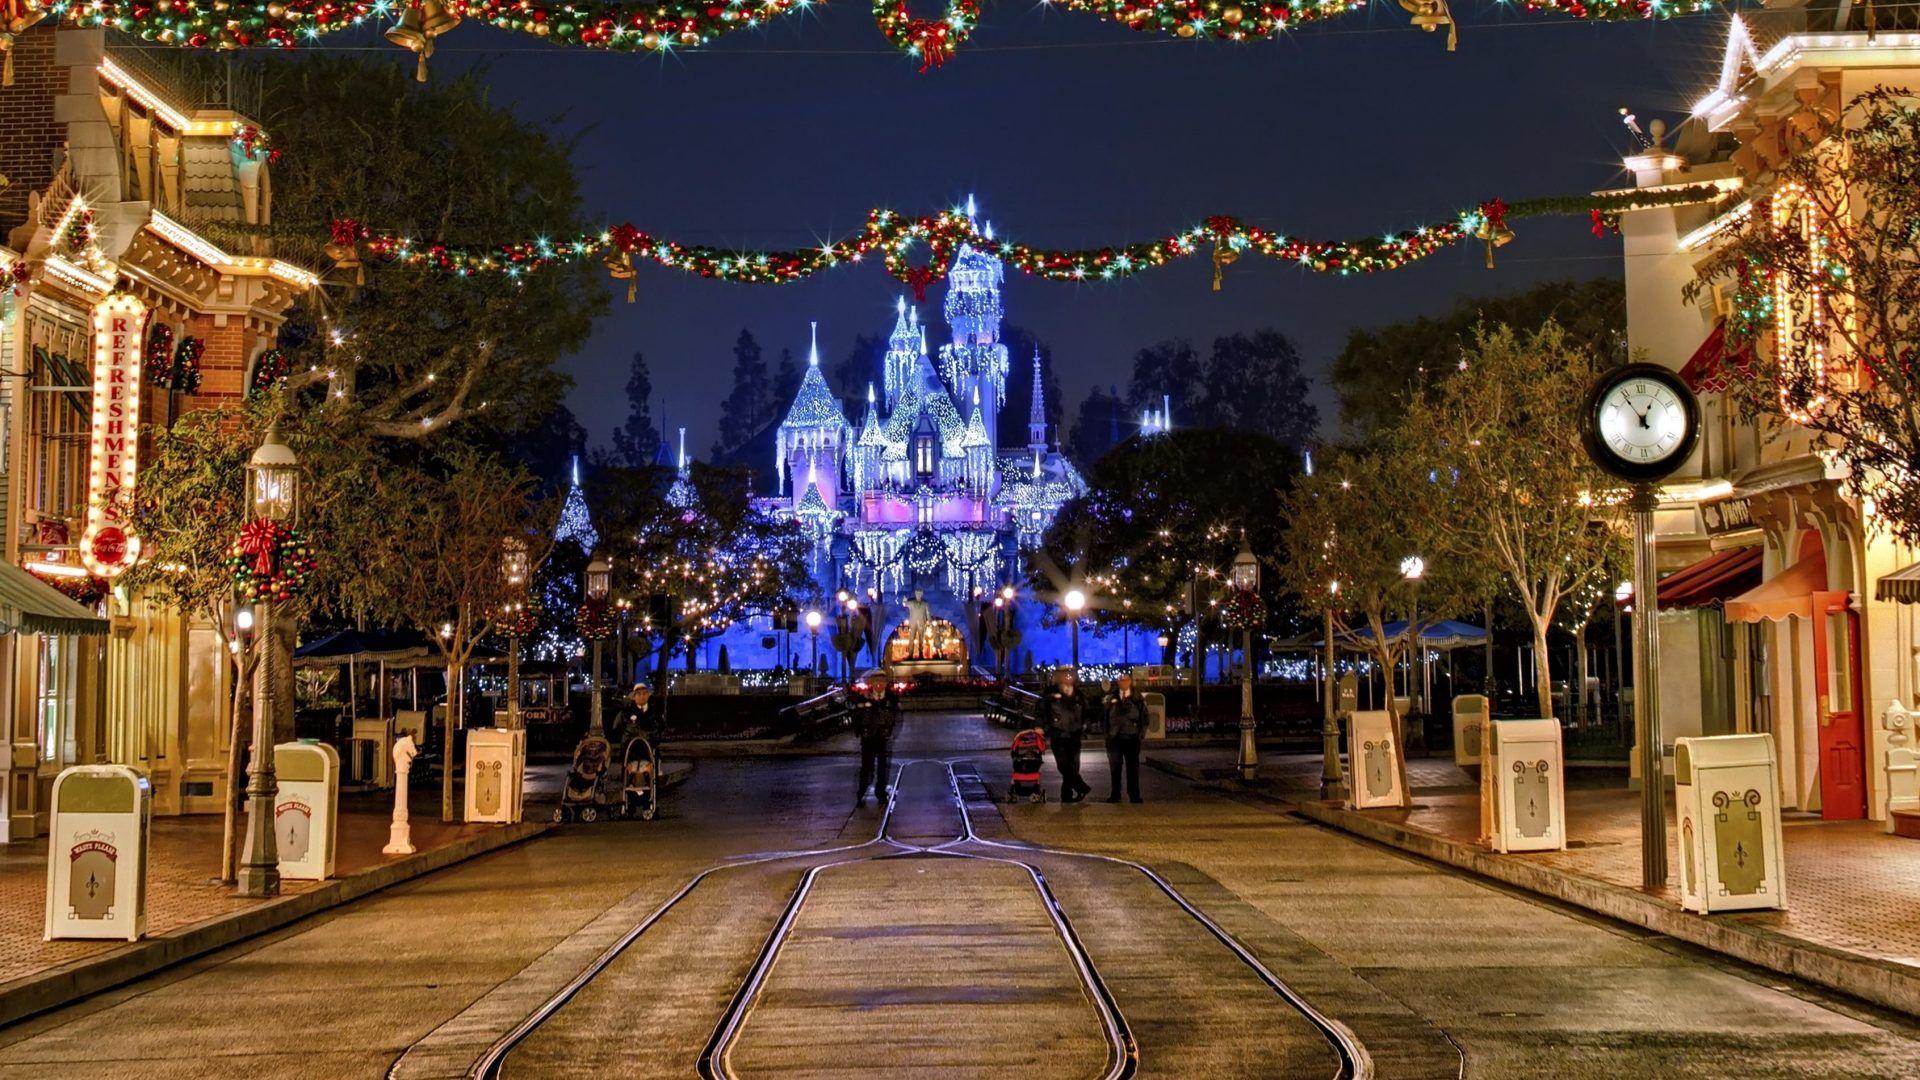 houseschristmaslightslanternscolorfullight